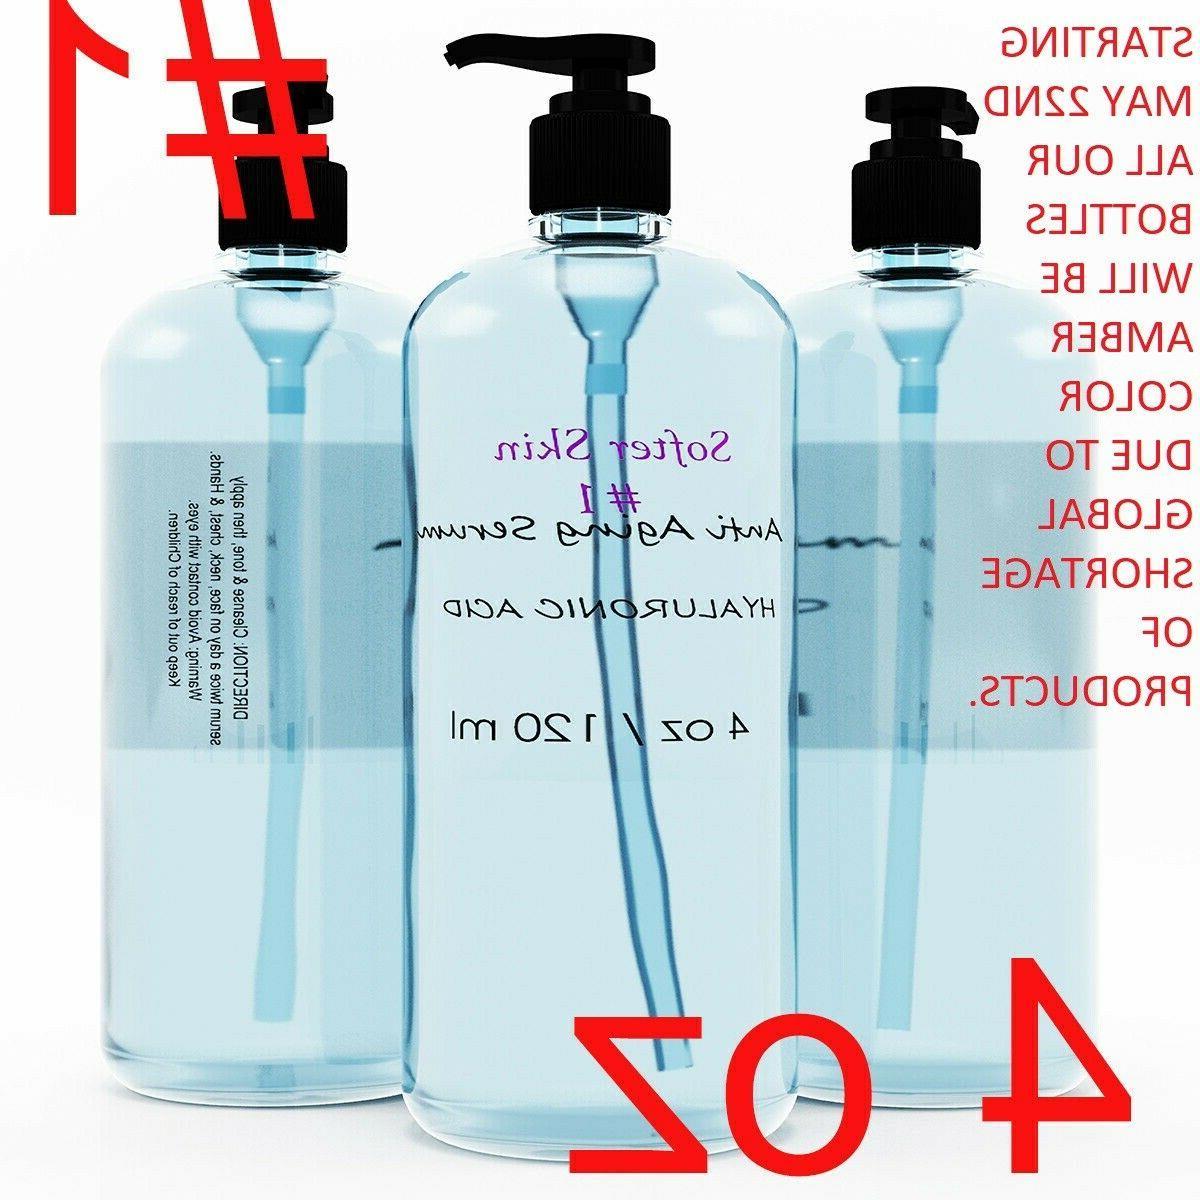 1 4 oz pure hyaluronic acid serum